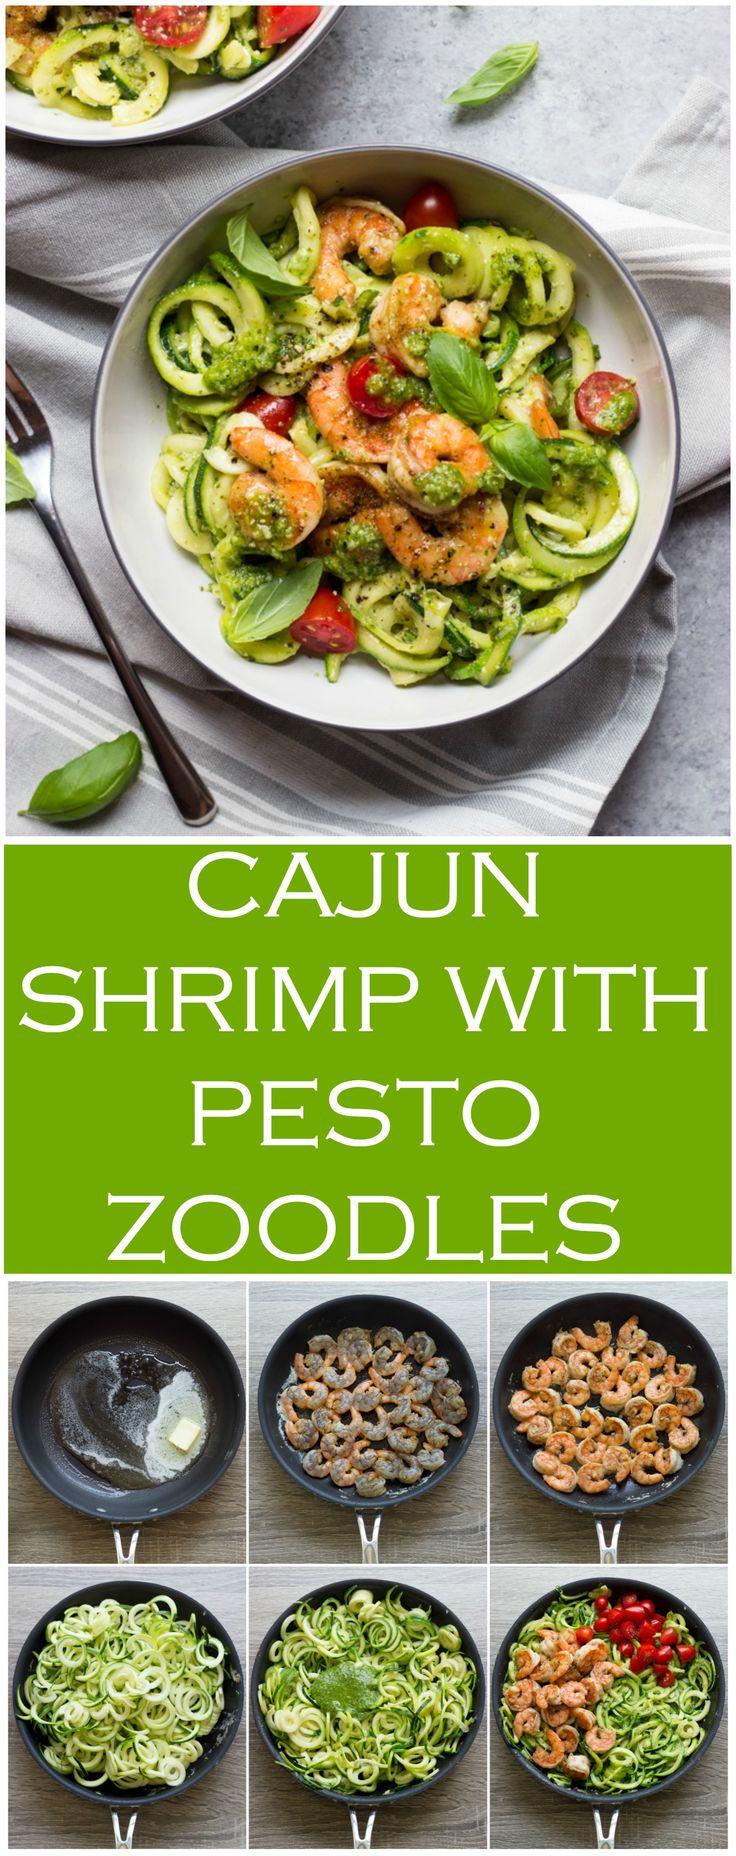 Cajun Shrimp with Pesto Zoodles - easy, light, nutritious, and flavorful summer meal | littlebroken.com @littlebroken